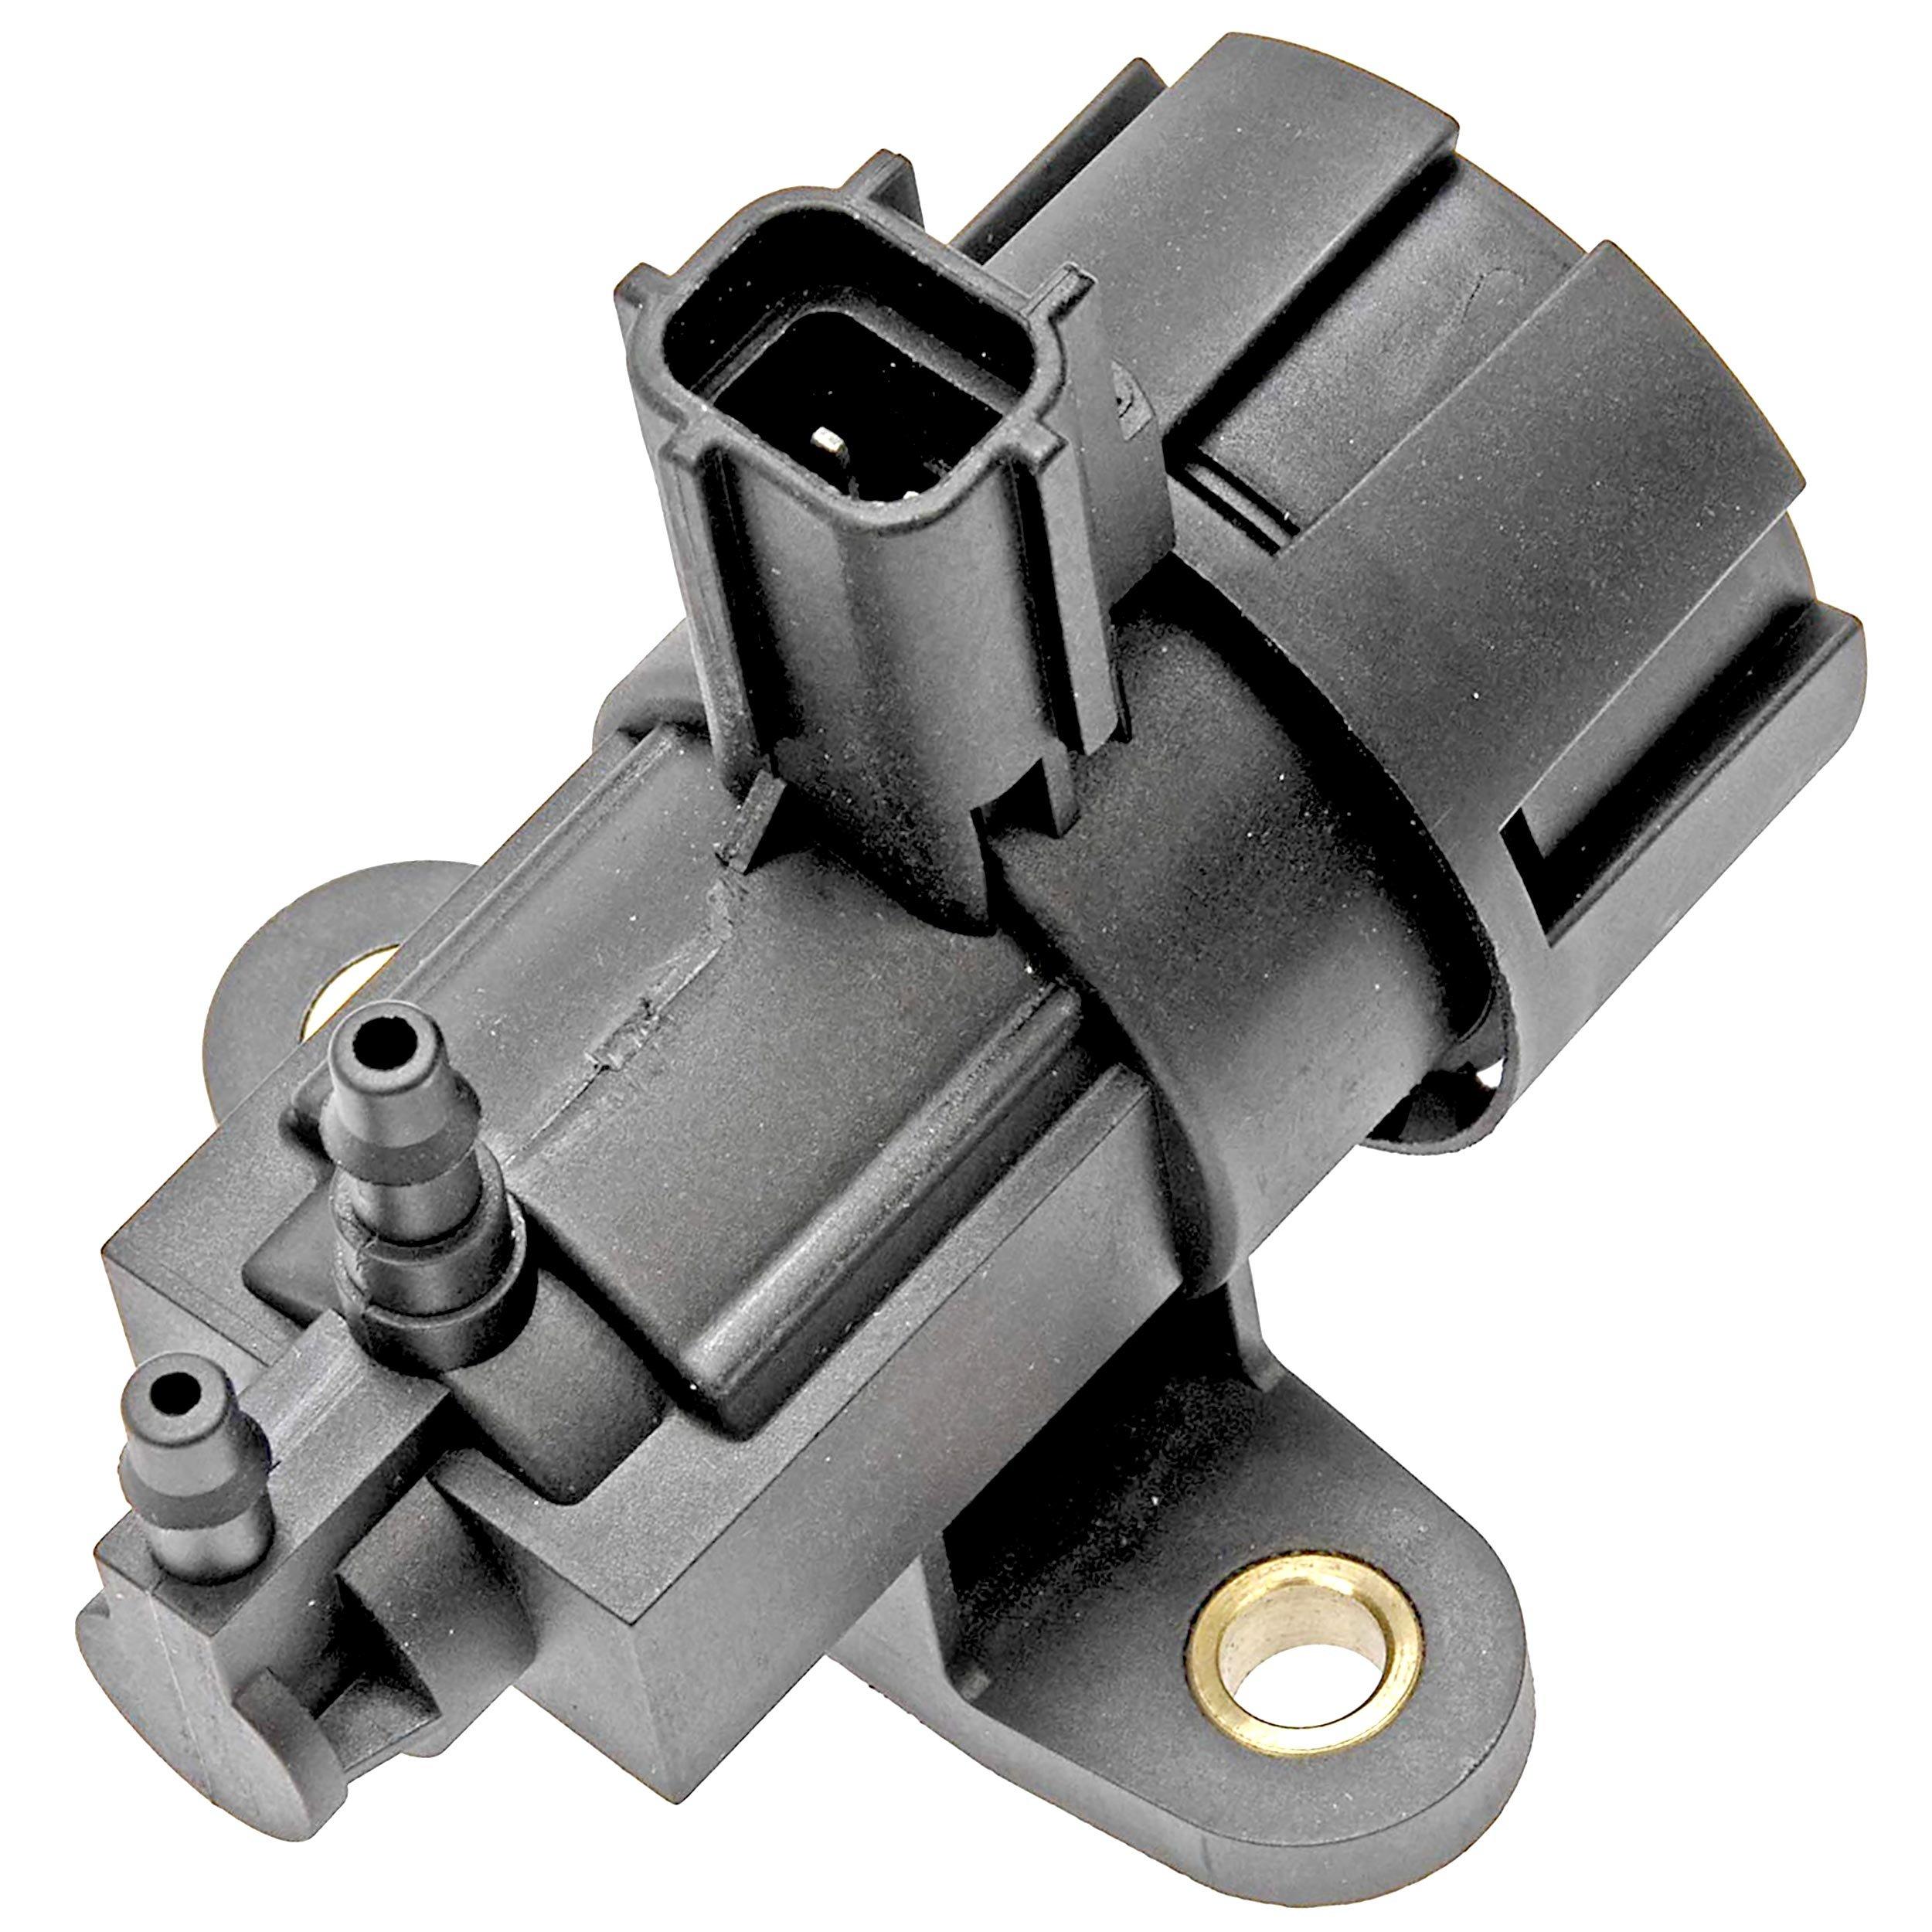 APDTY 022239 EGR Exhaust Gas Recirculation Vacuum Modulator Valve Solenoid (Replaces F63Z-9J459-AA, F63Z9J459AA, F57Z-9J459C, ZZM3-20-35A, VS63, 911-128)